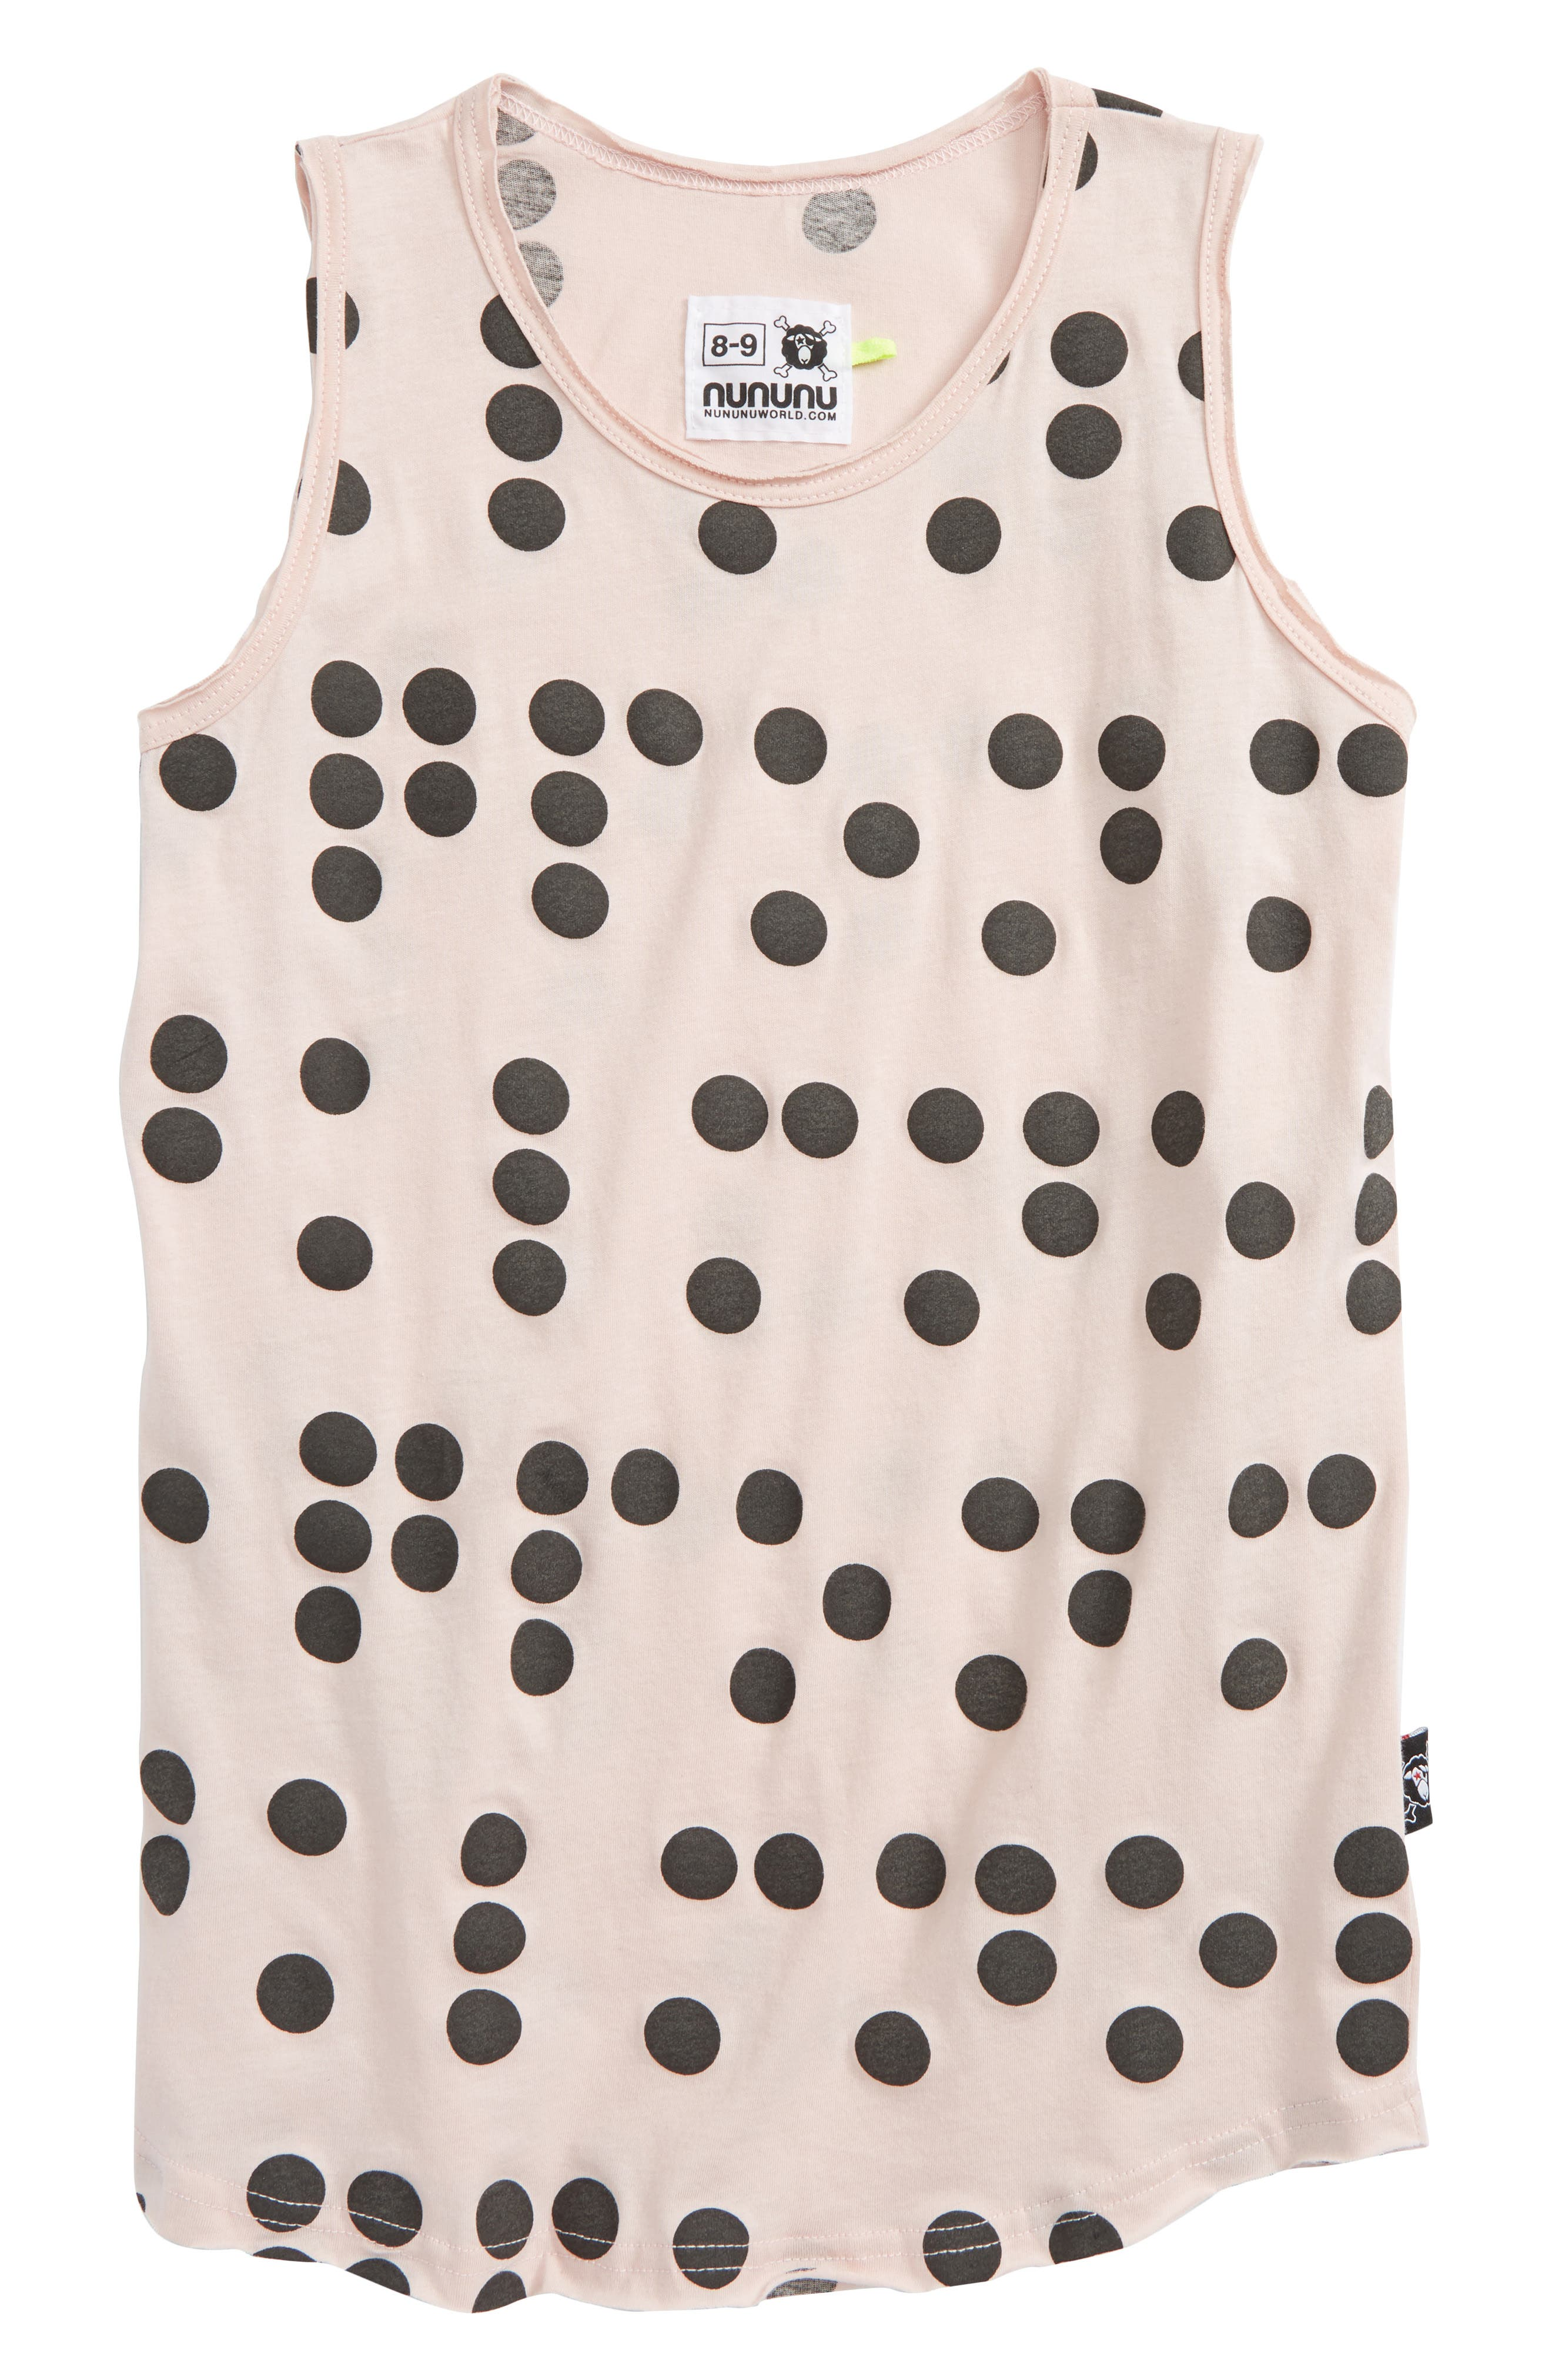 Braille Dot Tank,                             Main thumbnail 1, color,                             Powder Pink